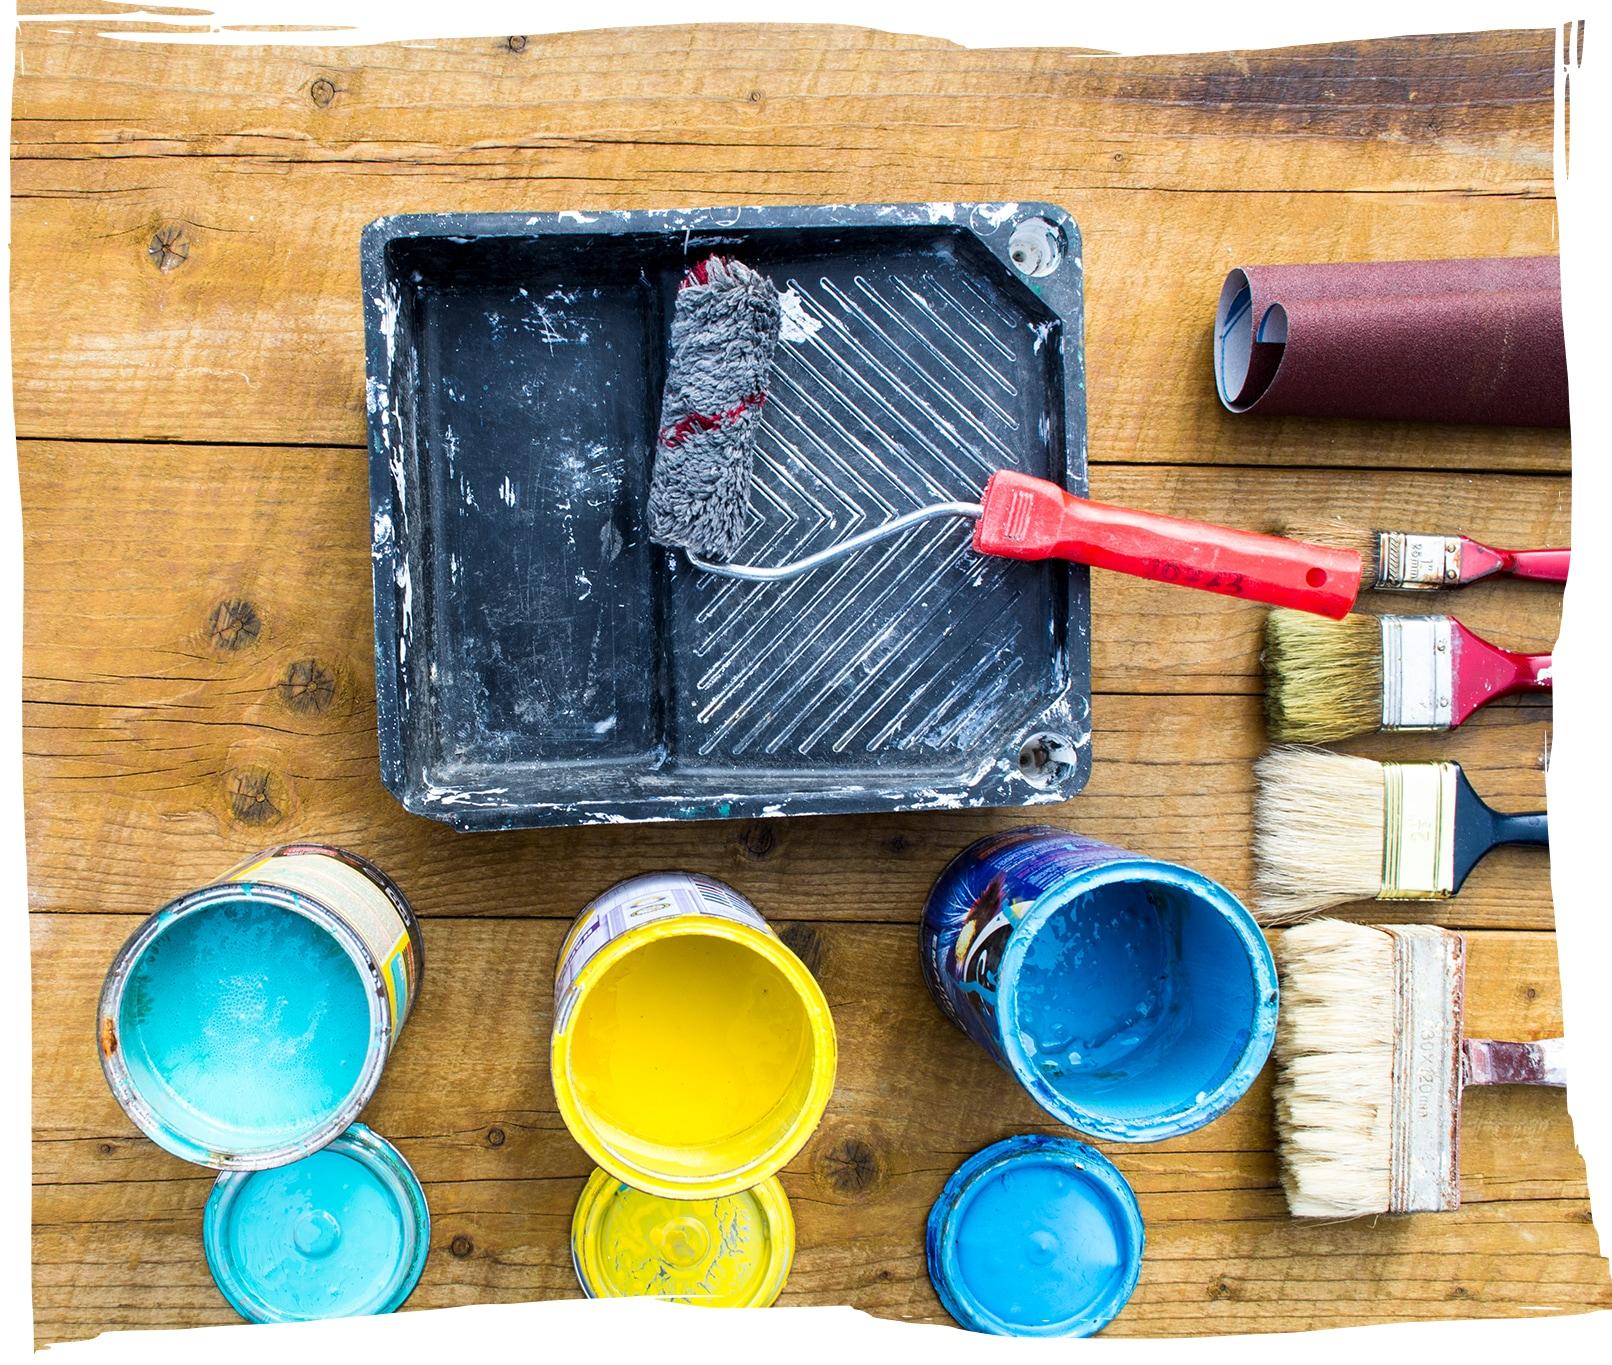 malermeister-abel-ratingen-malerarbeiten-lackieren-quadrat